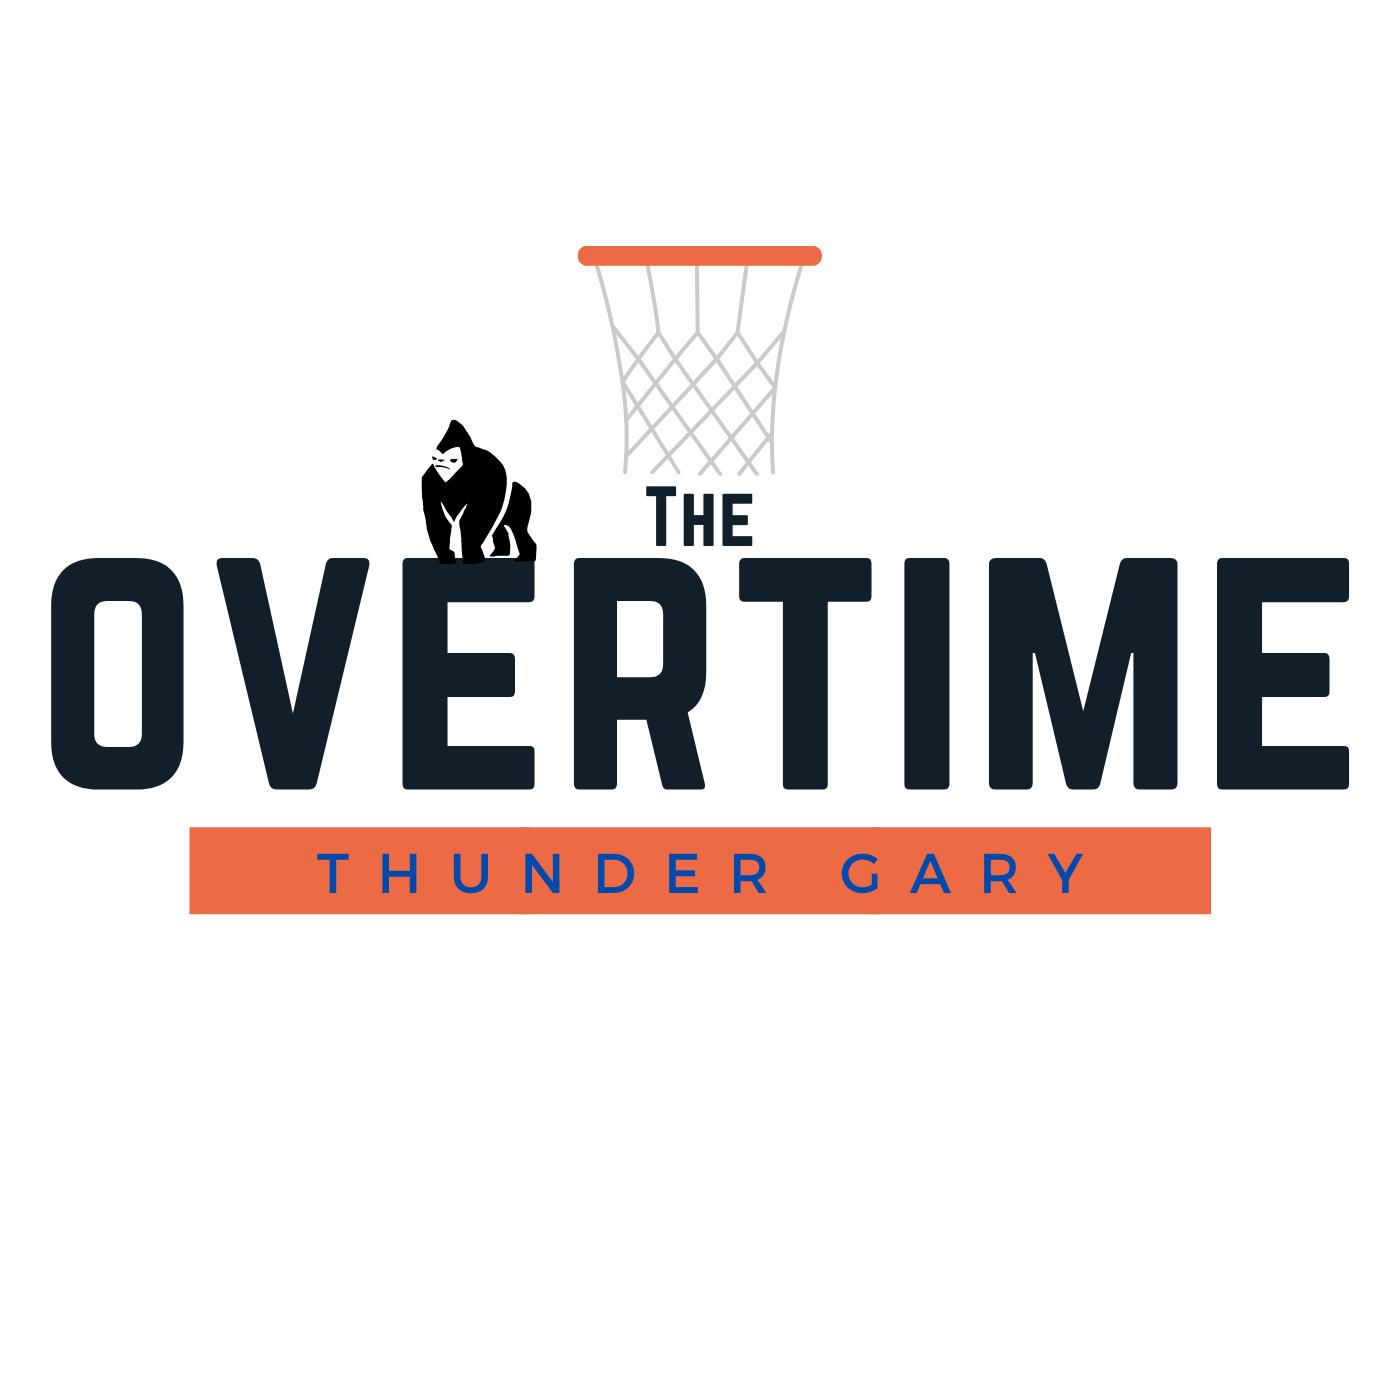 The 23rd Overtime | ESPN前50大球員評論!2020-2021賽季球員獎項預測!